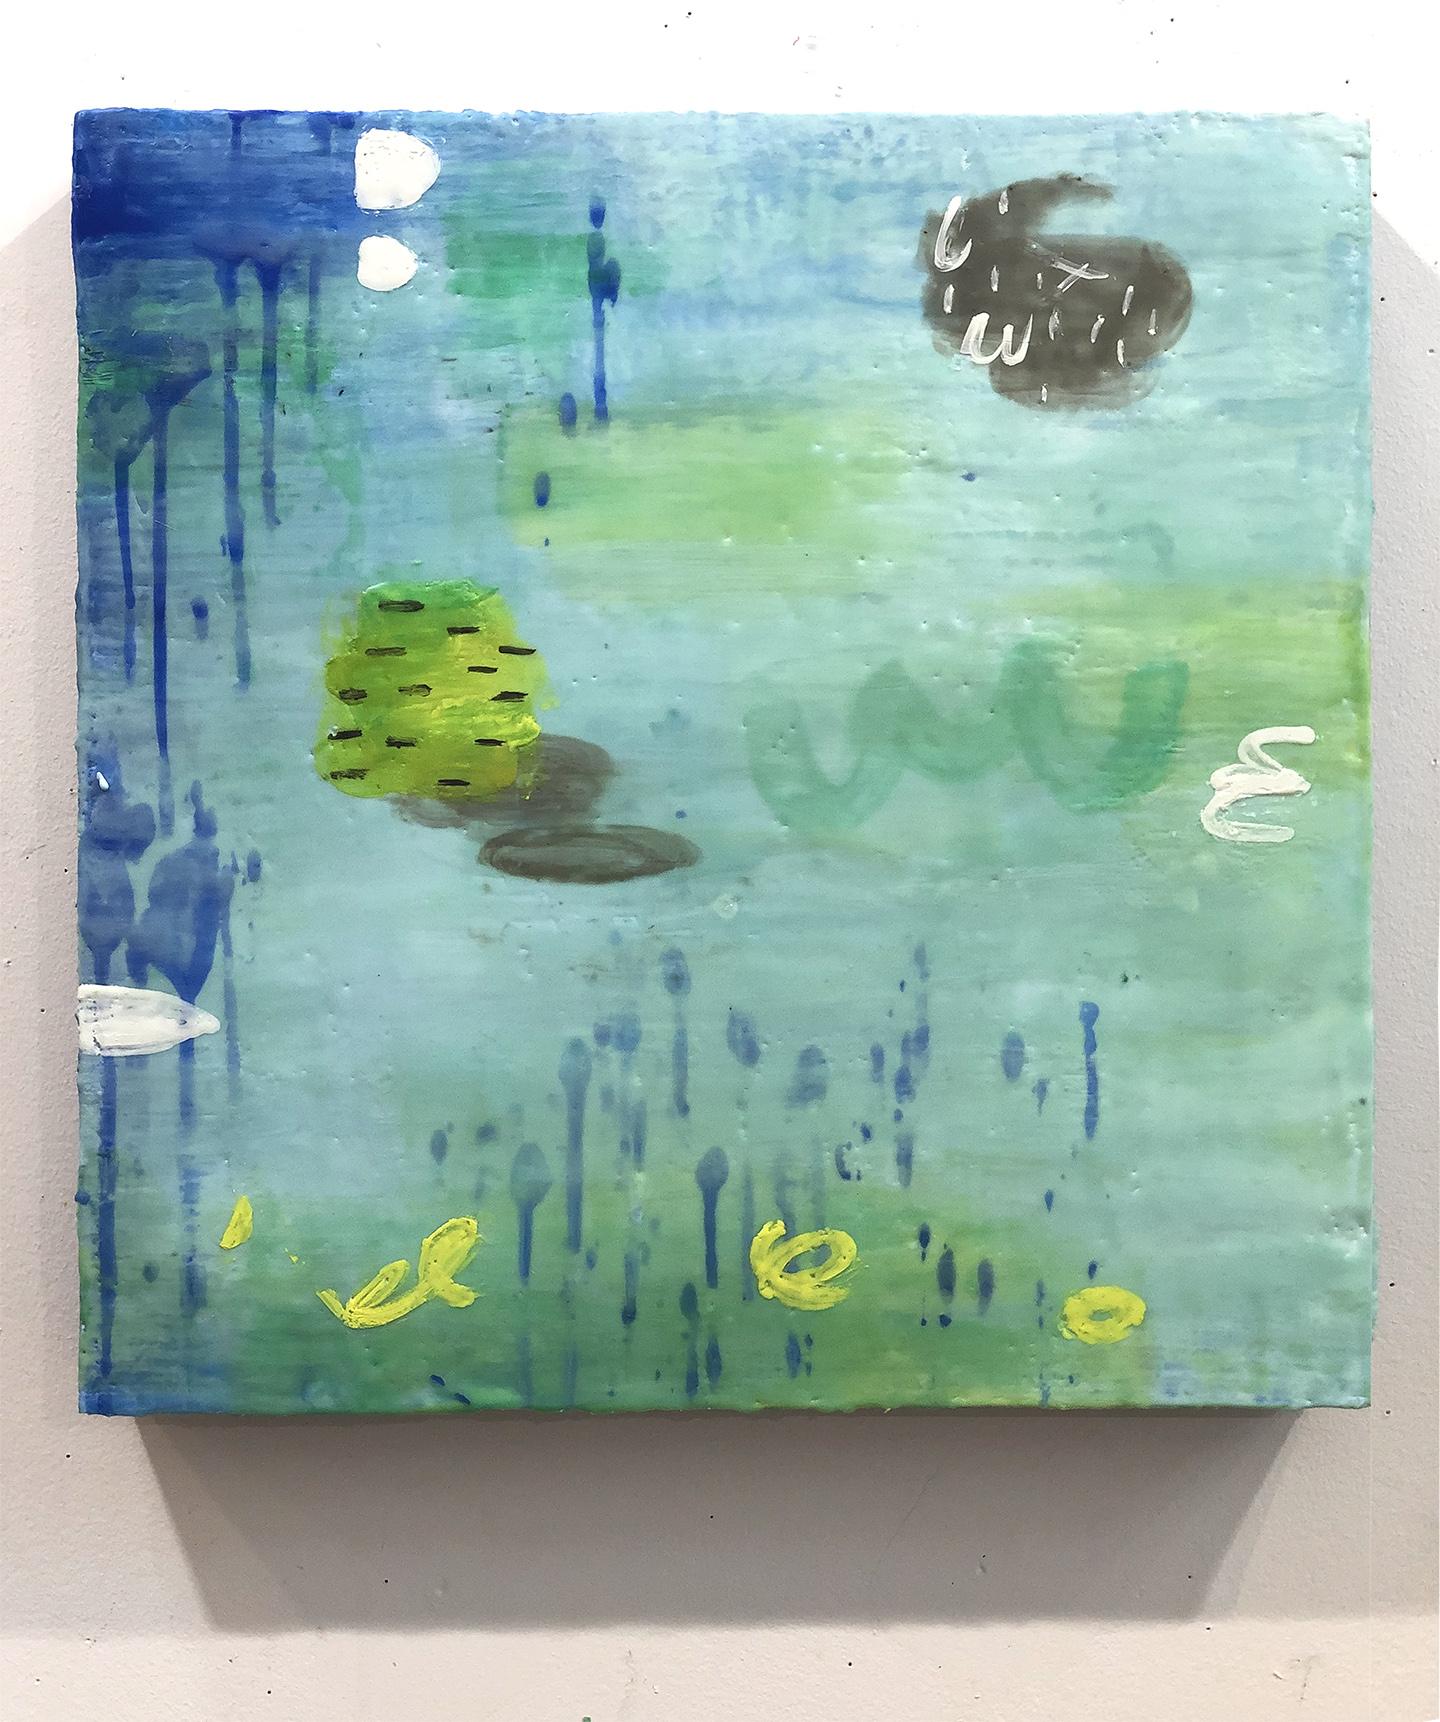 Rana-Rochat-Untitled-16x16-Encaustic-on-panel